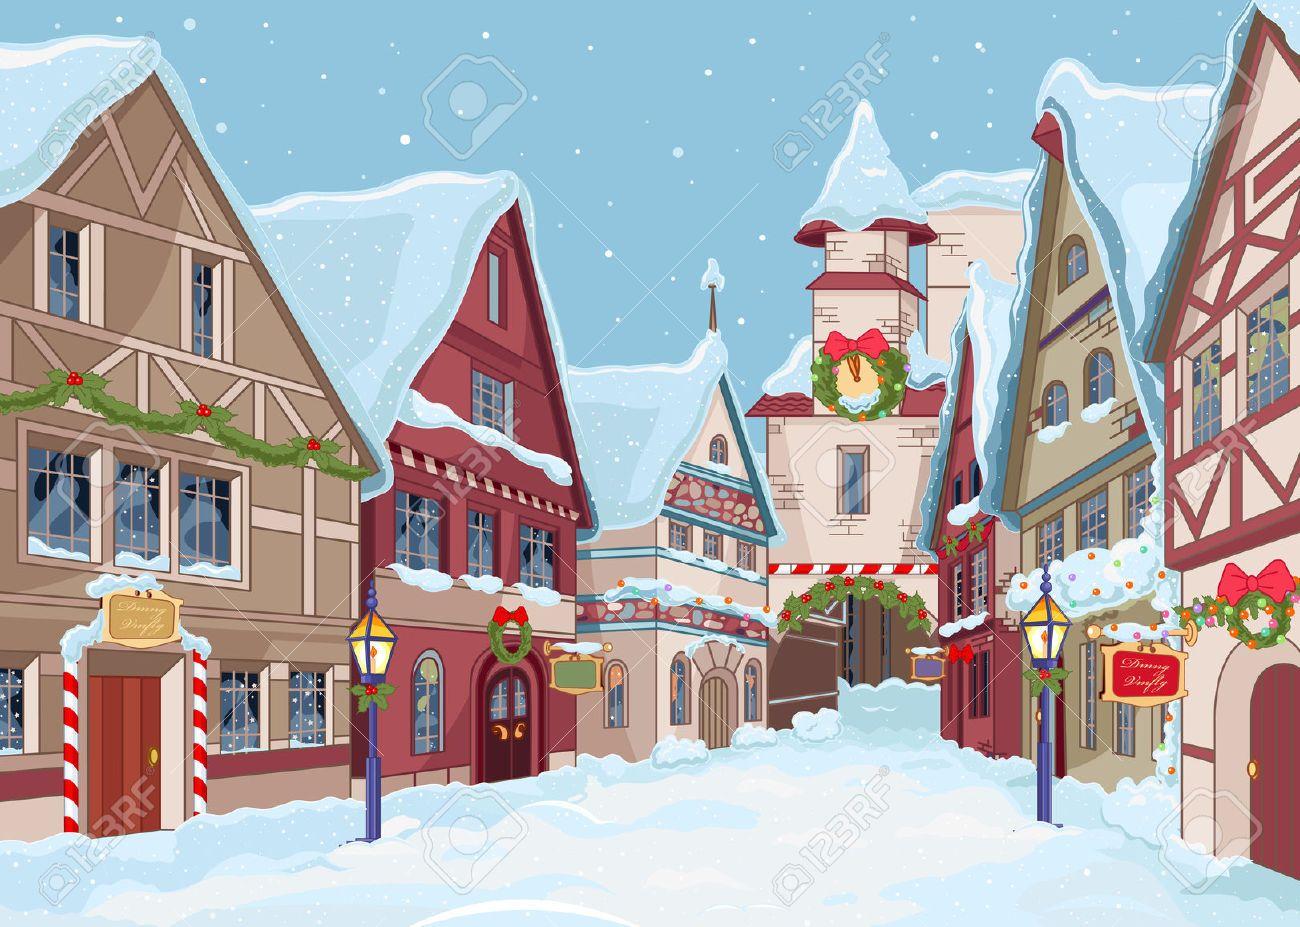 winter village with snow cartoon - Google Search ...